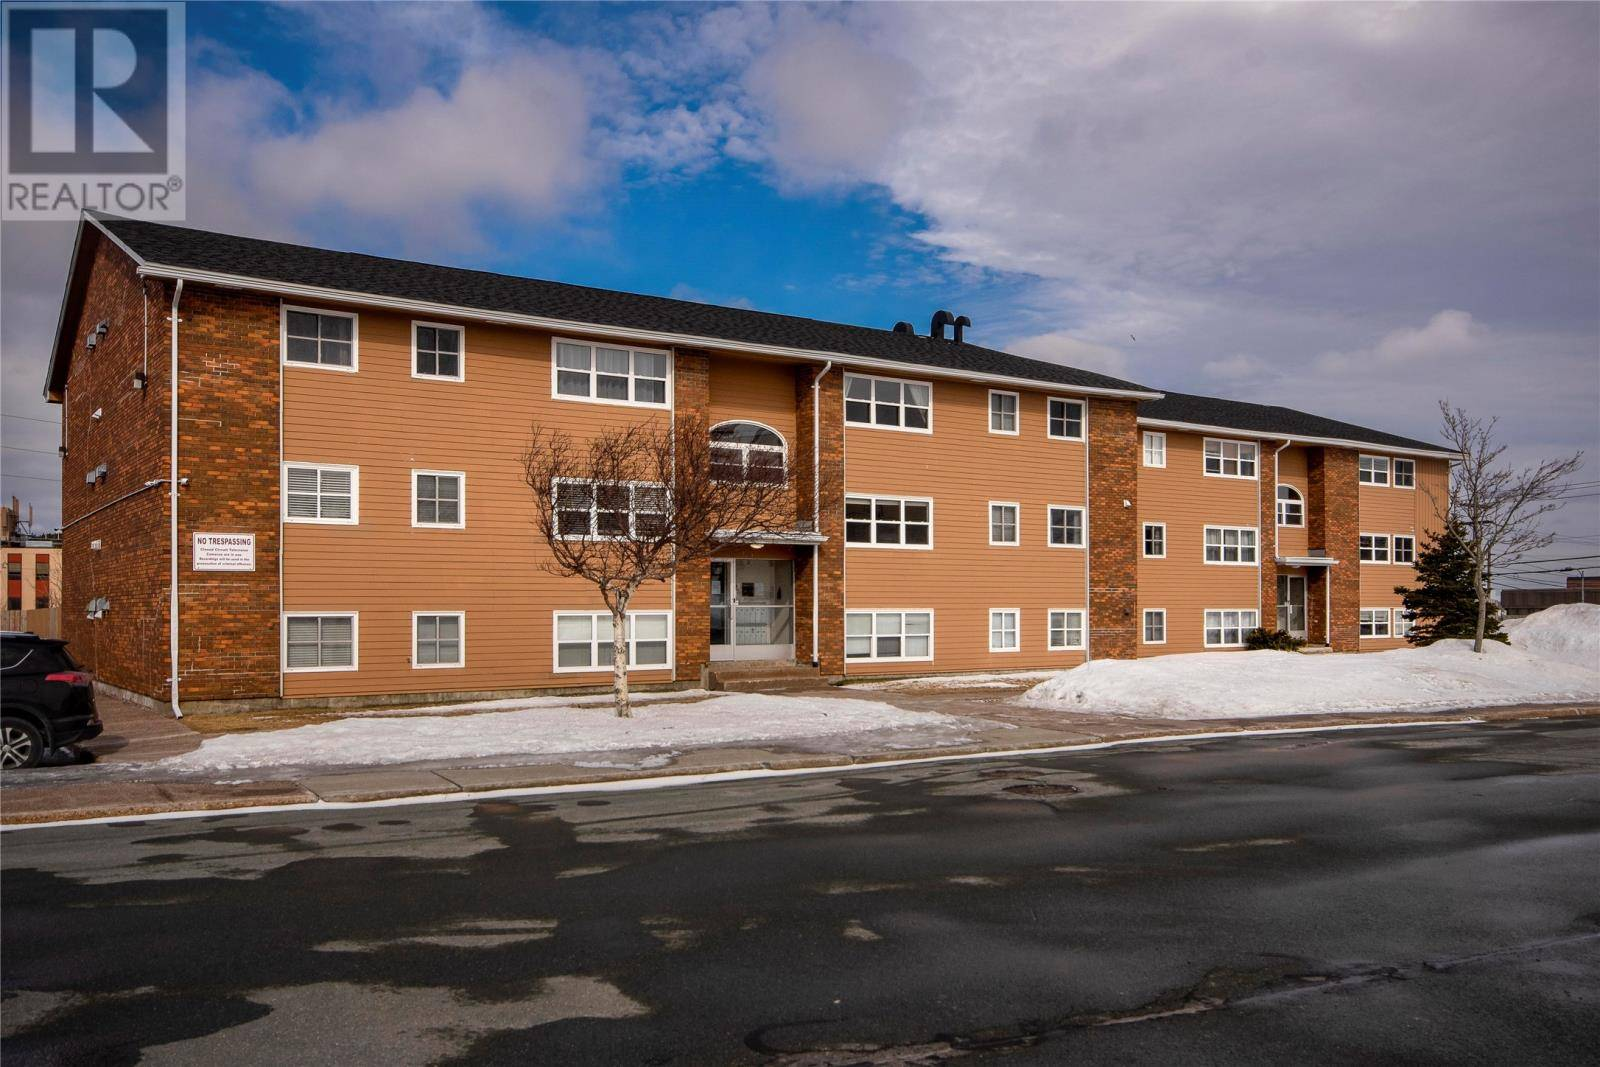 House for sale at 122 Terra Nova Rd Unit 105 St John's Newfoundland - MLS: 1212078